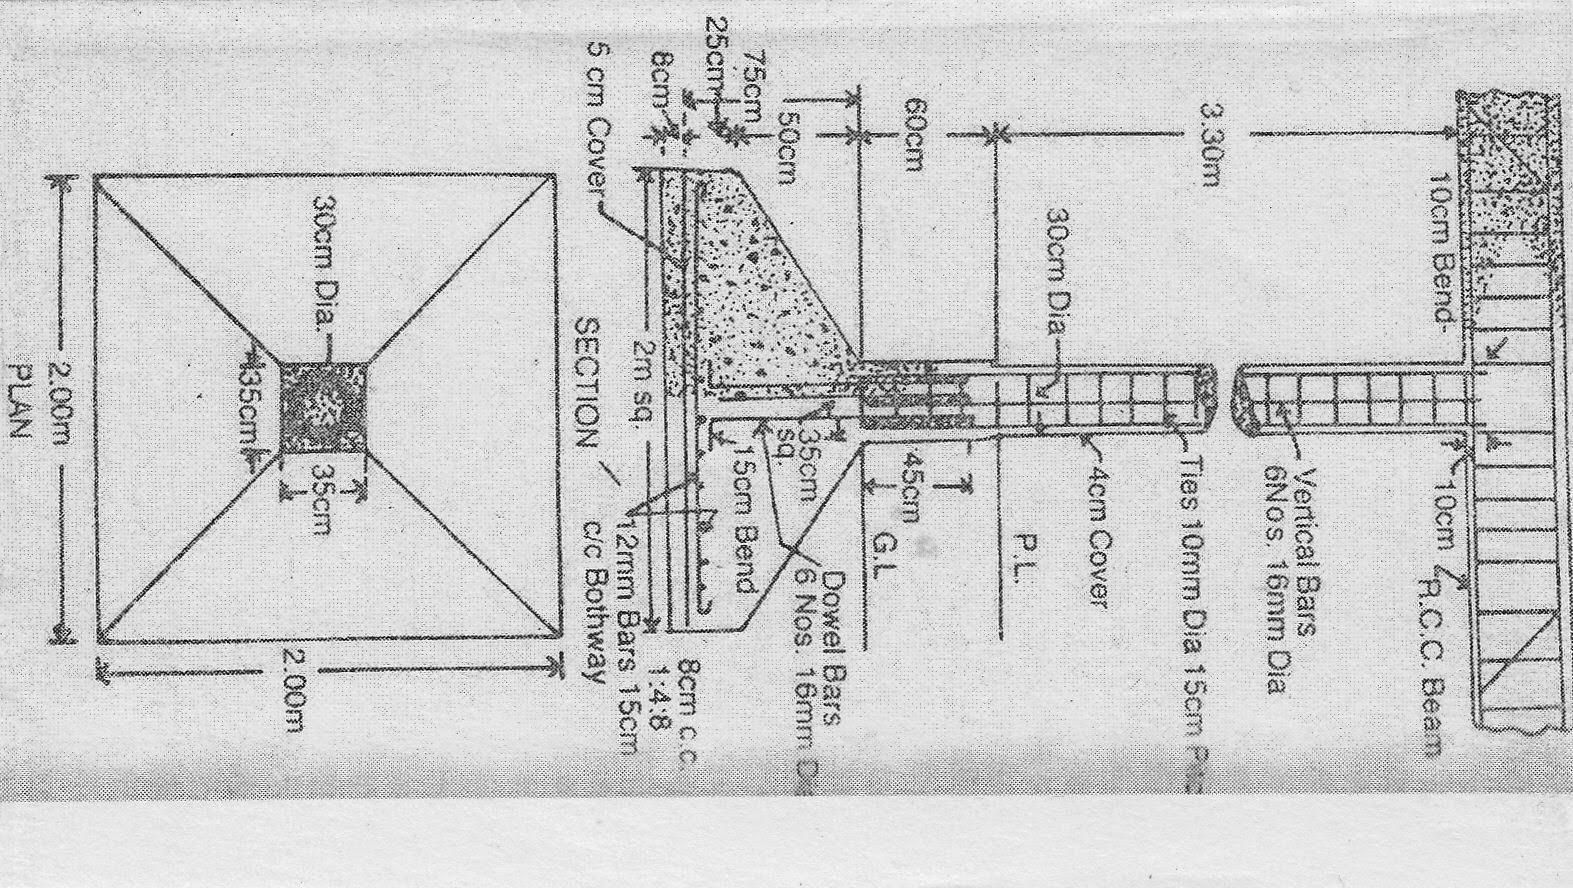 Rcc Slab Design : Rcc t beam column slab roof design example